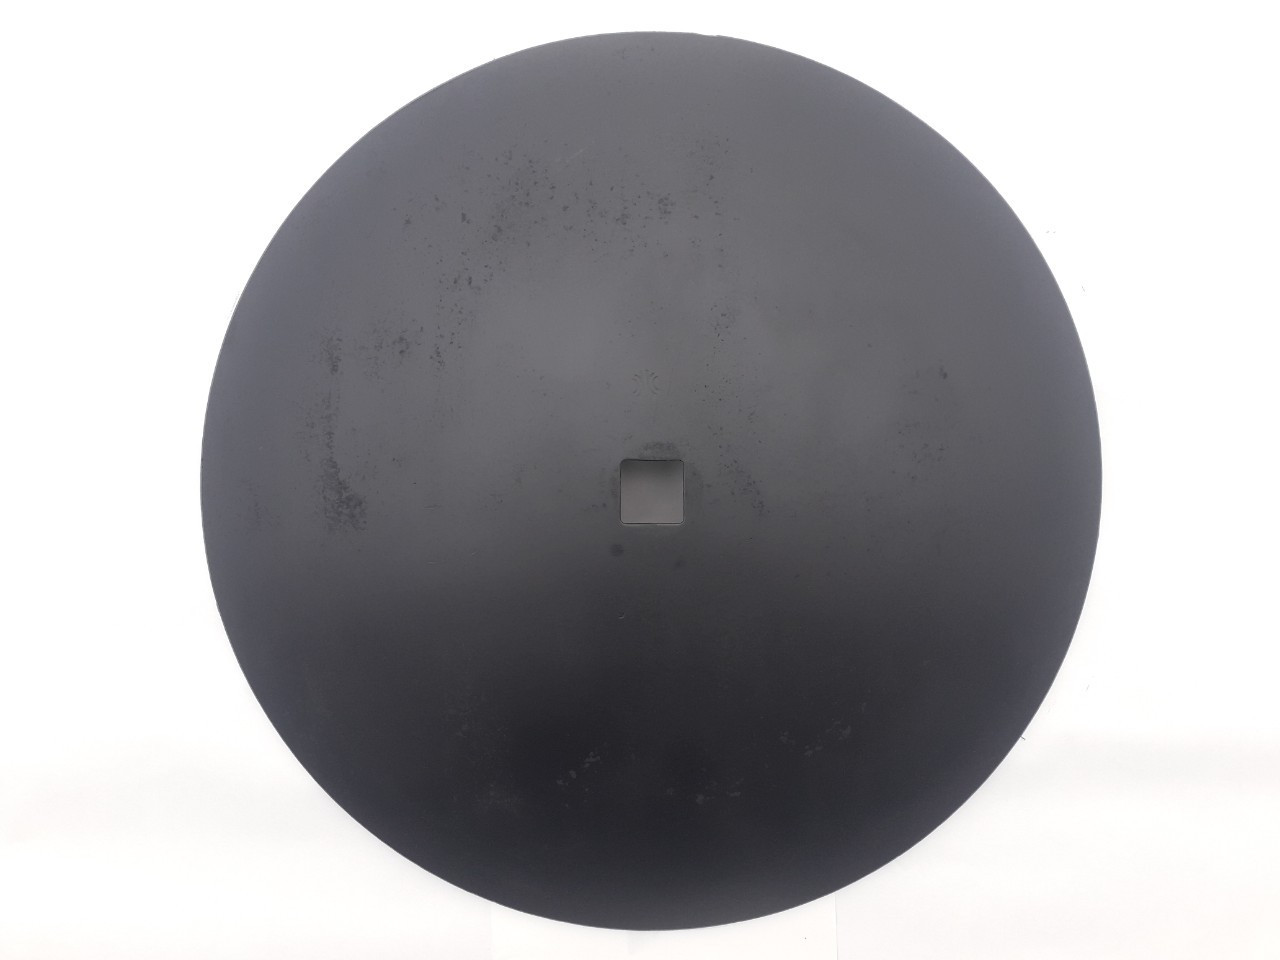 Диск бороны Gregoire Besson D=510 мм, кв41, h=6мм гладкий ст30MnB5 Грегори бессон арт. 851002098